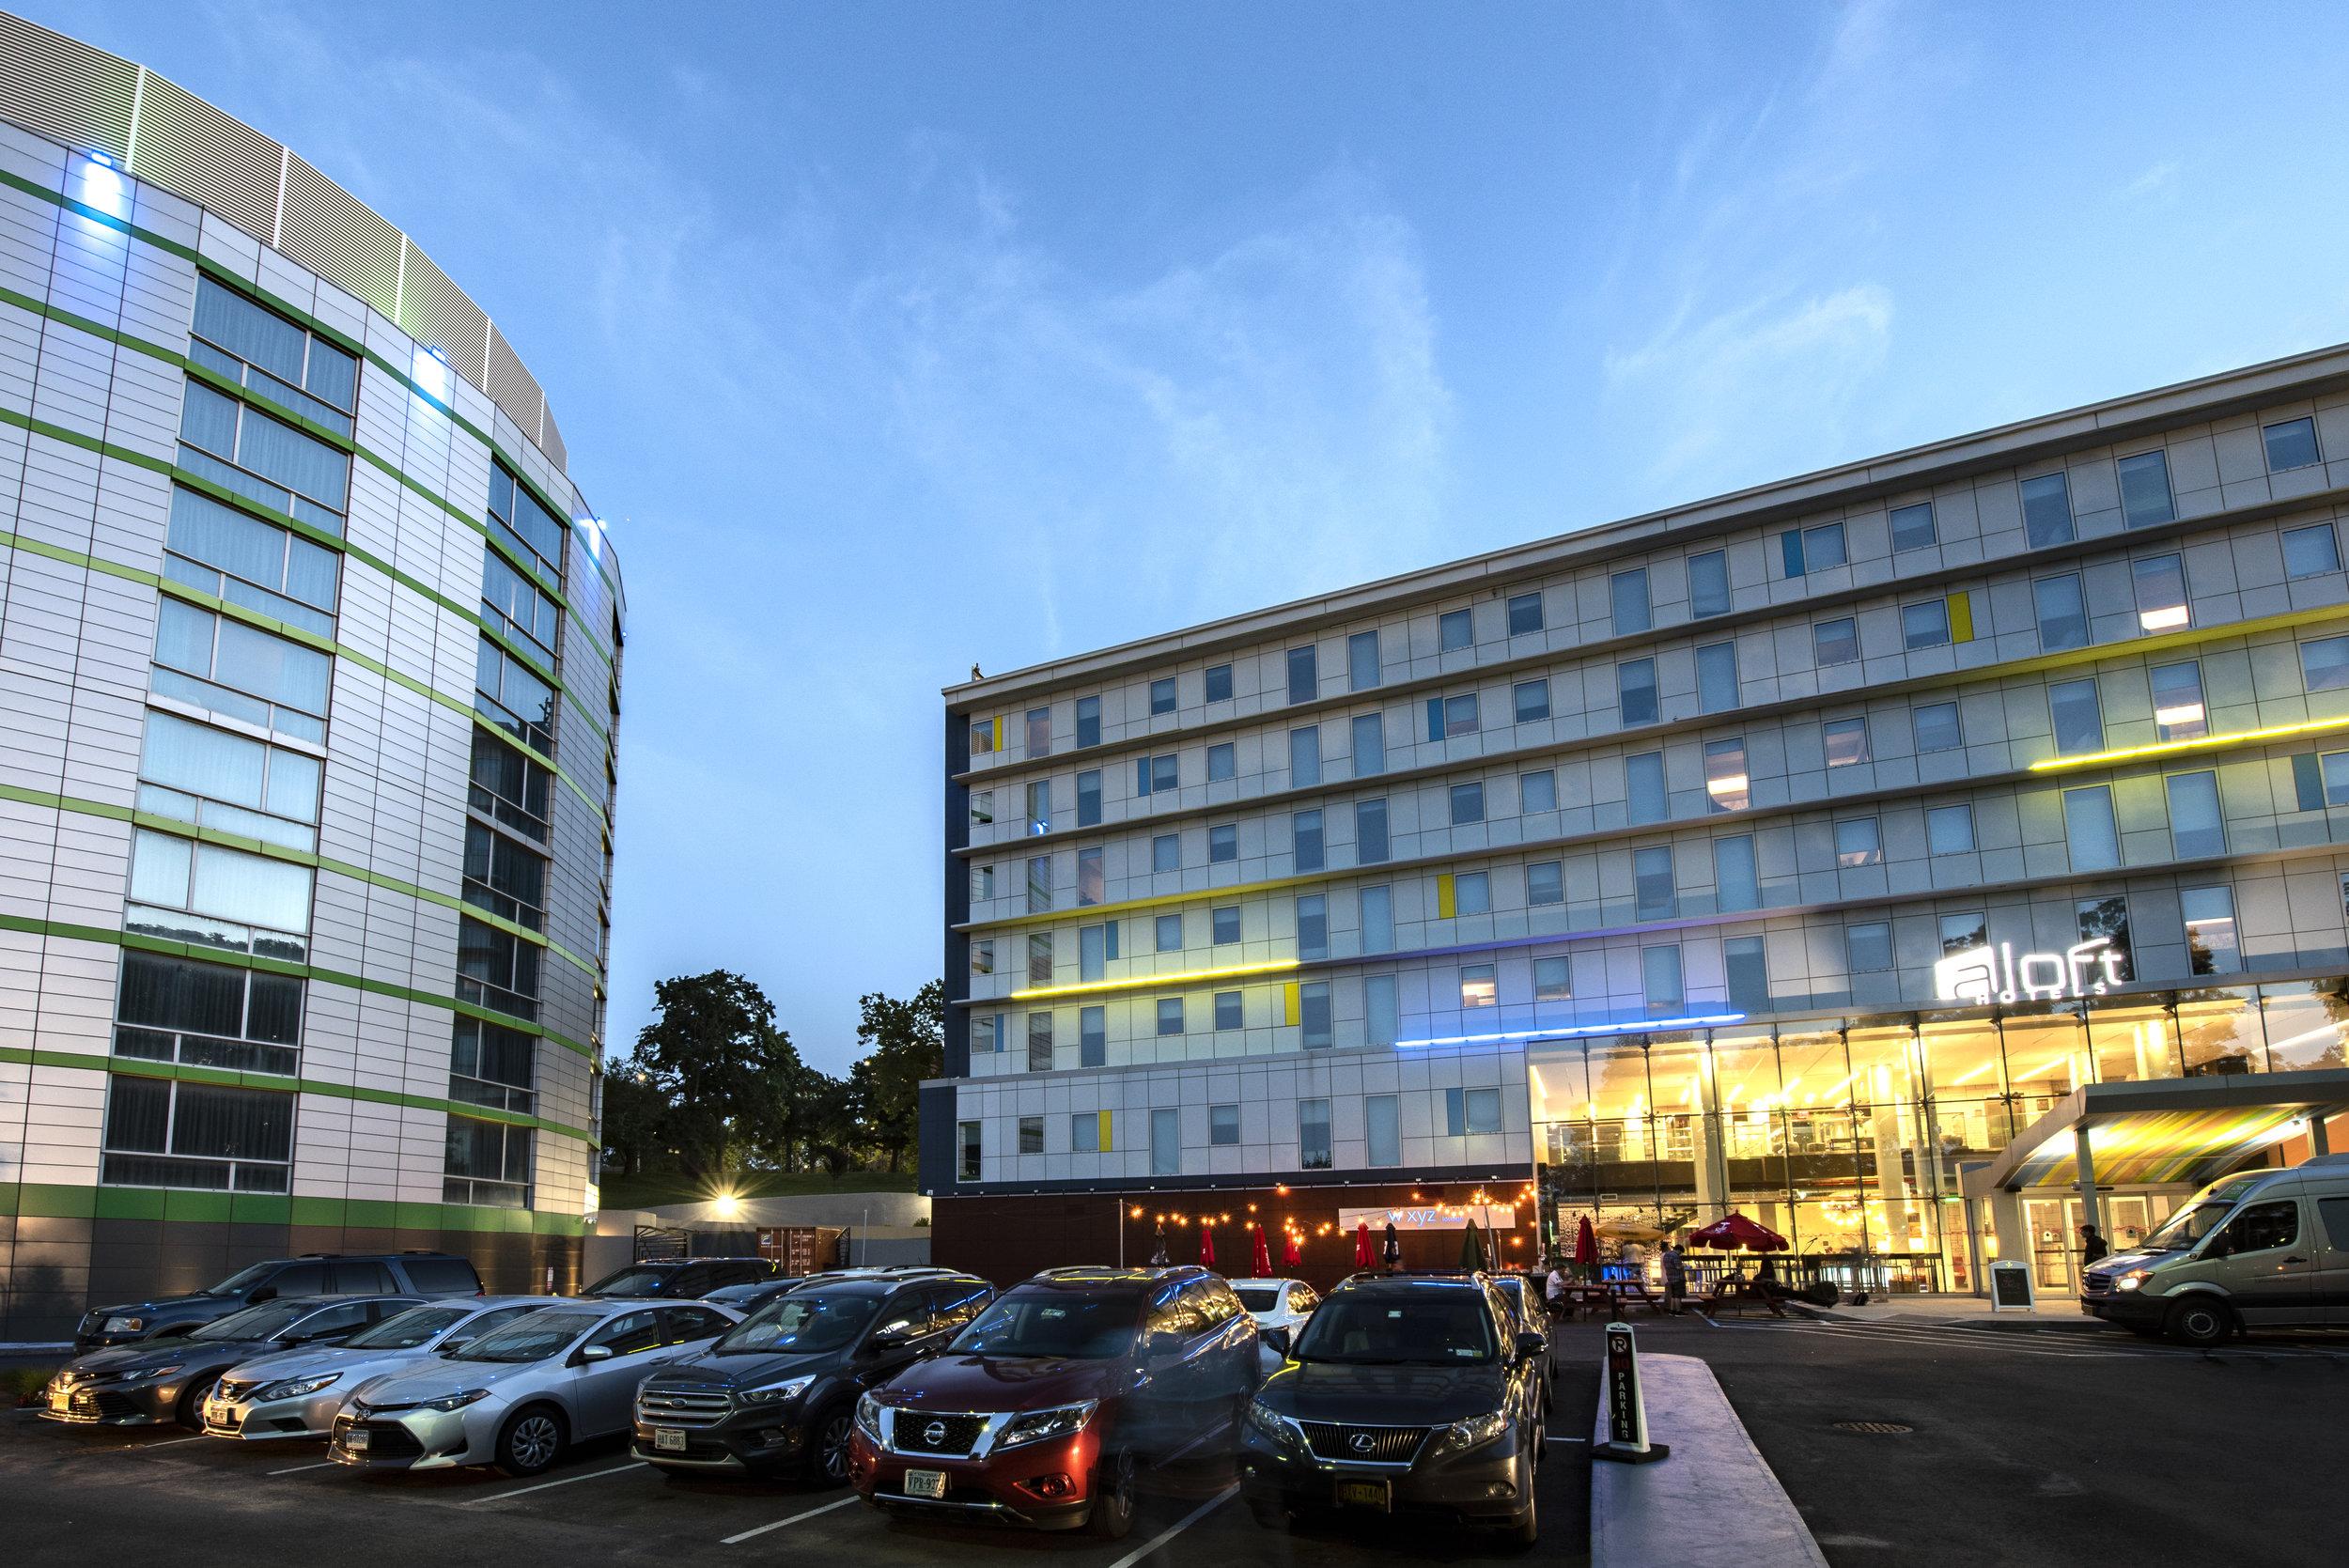 Aloft & Ibis Hotels #101.jpg